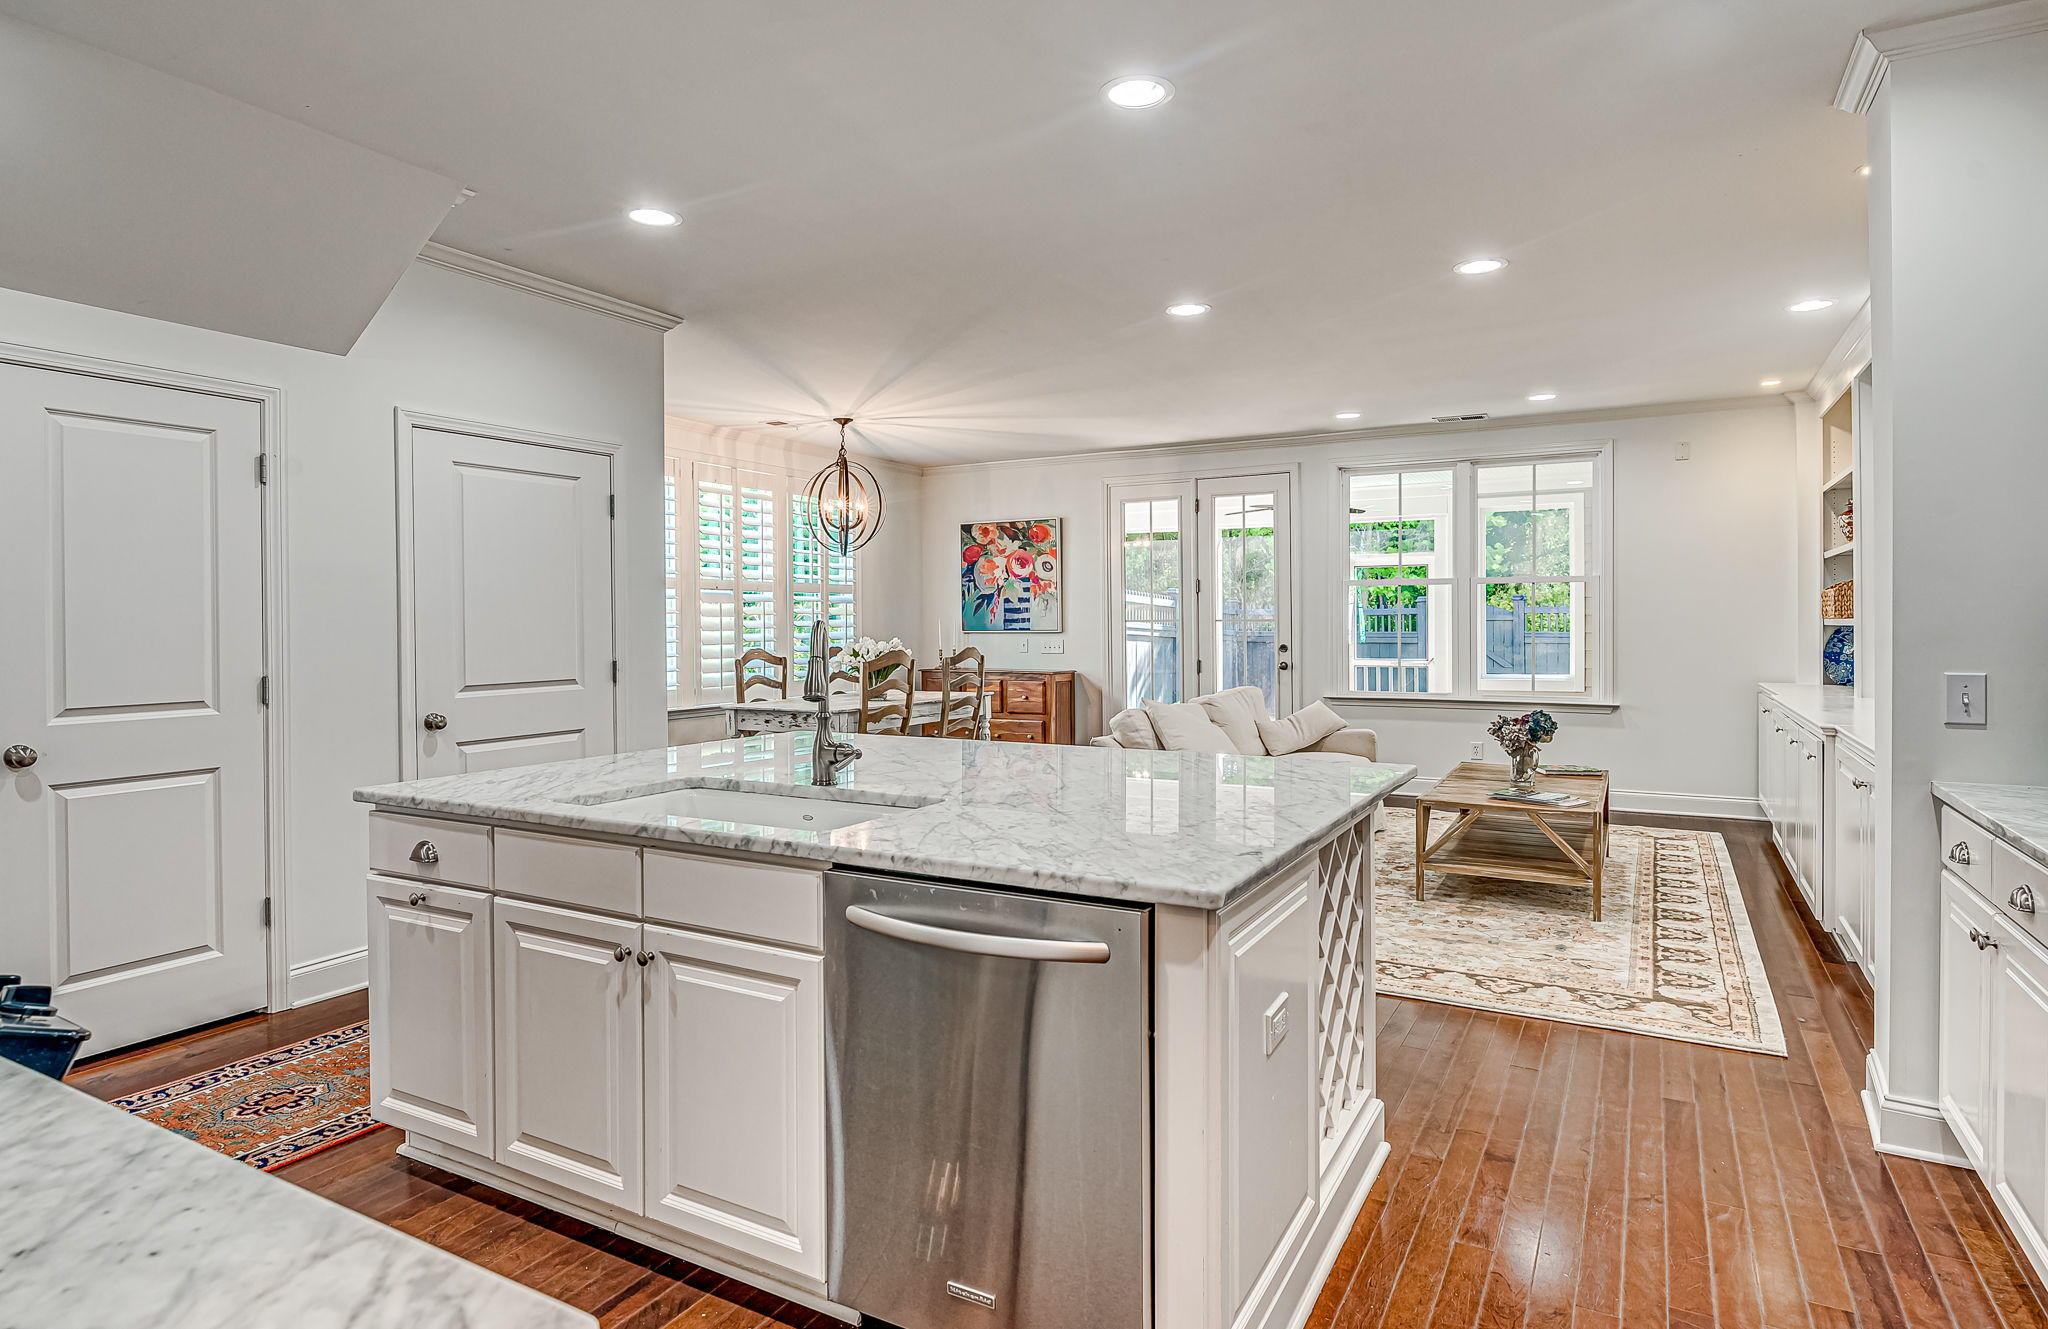 Dunes West Homes For Sale - 2476 Kings Gate, Mount Pleasant, SC - 47